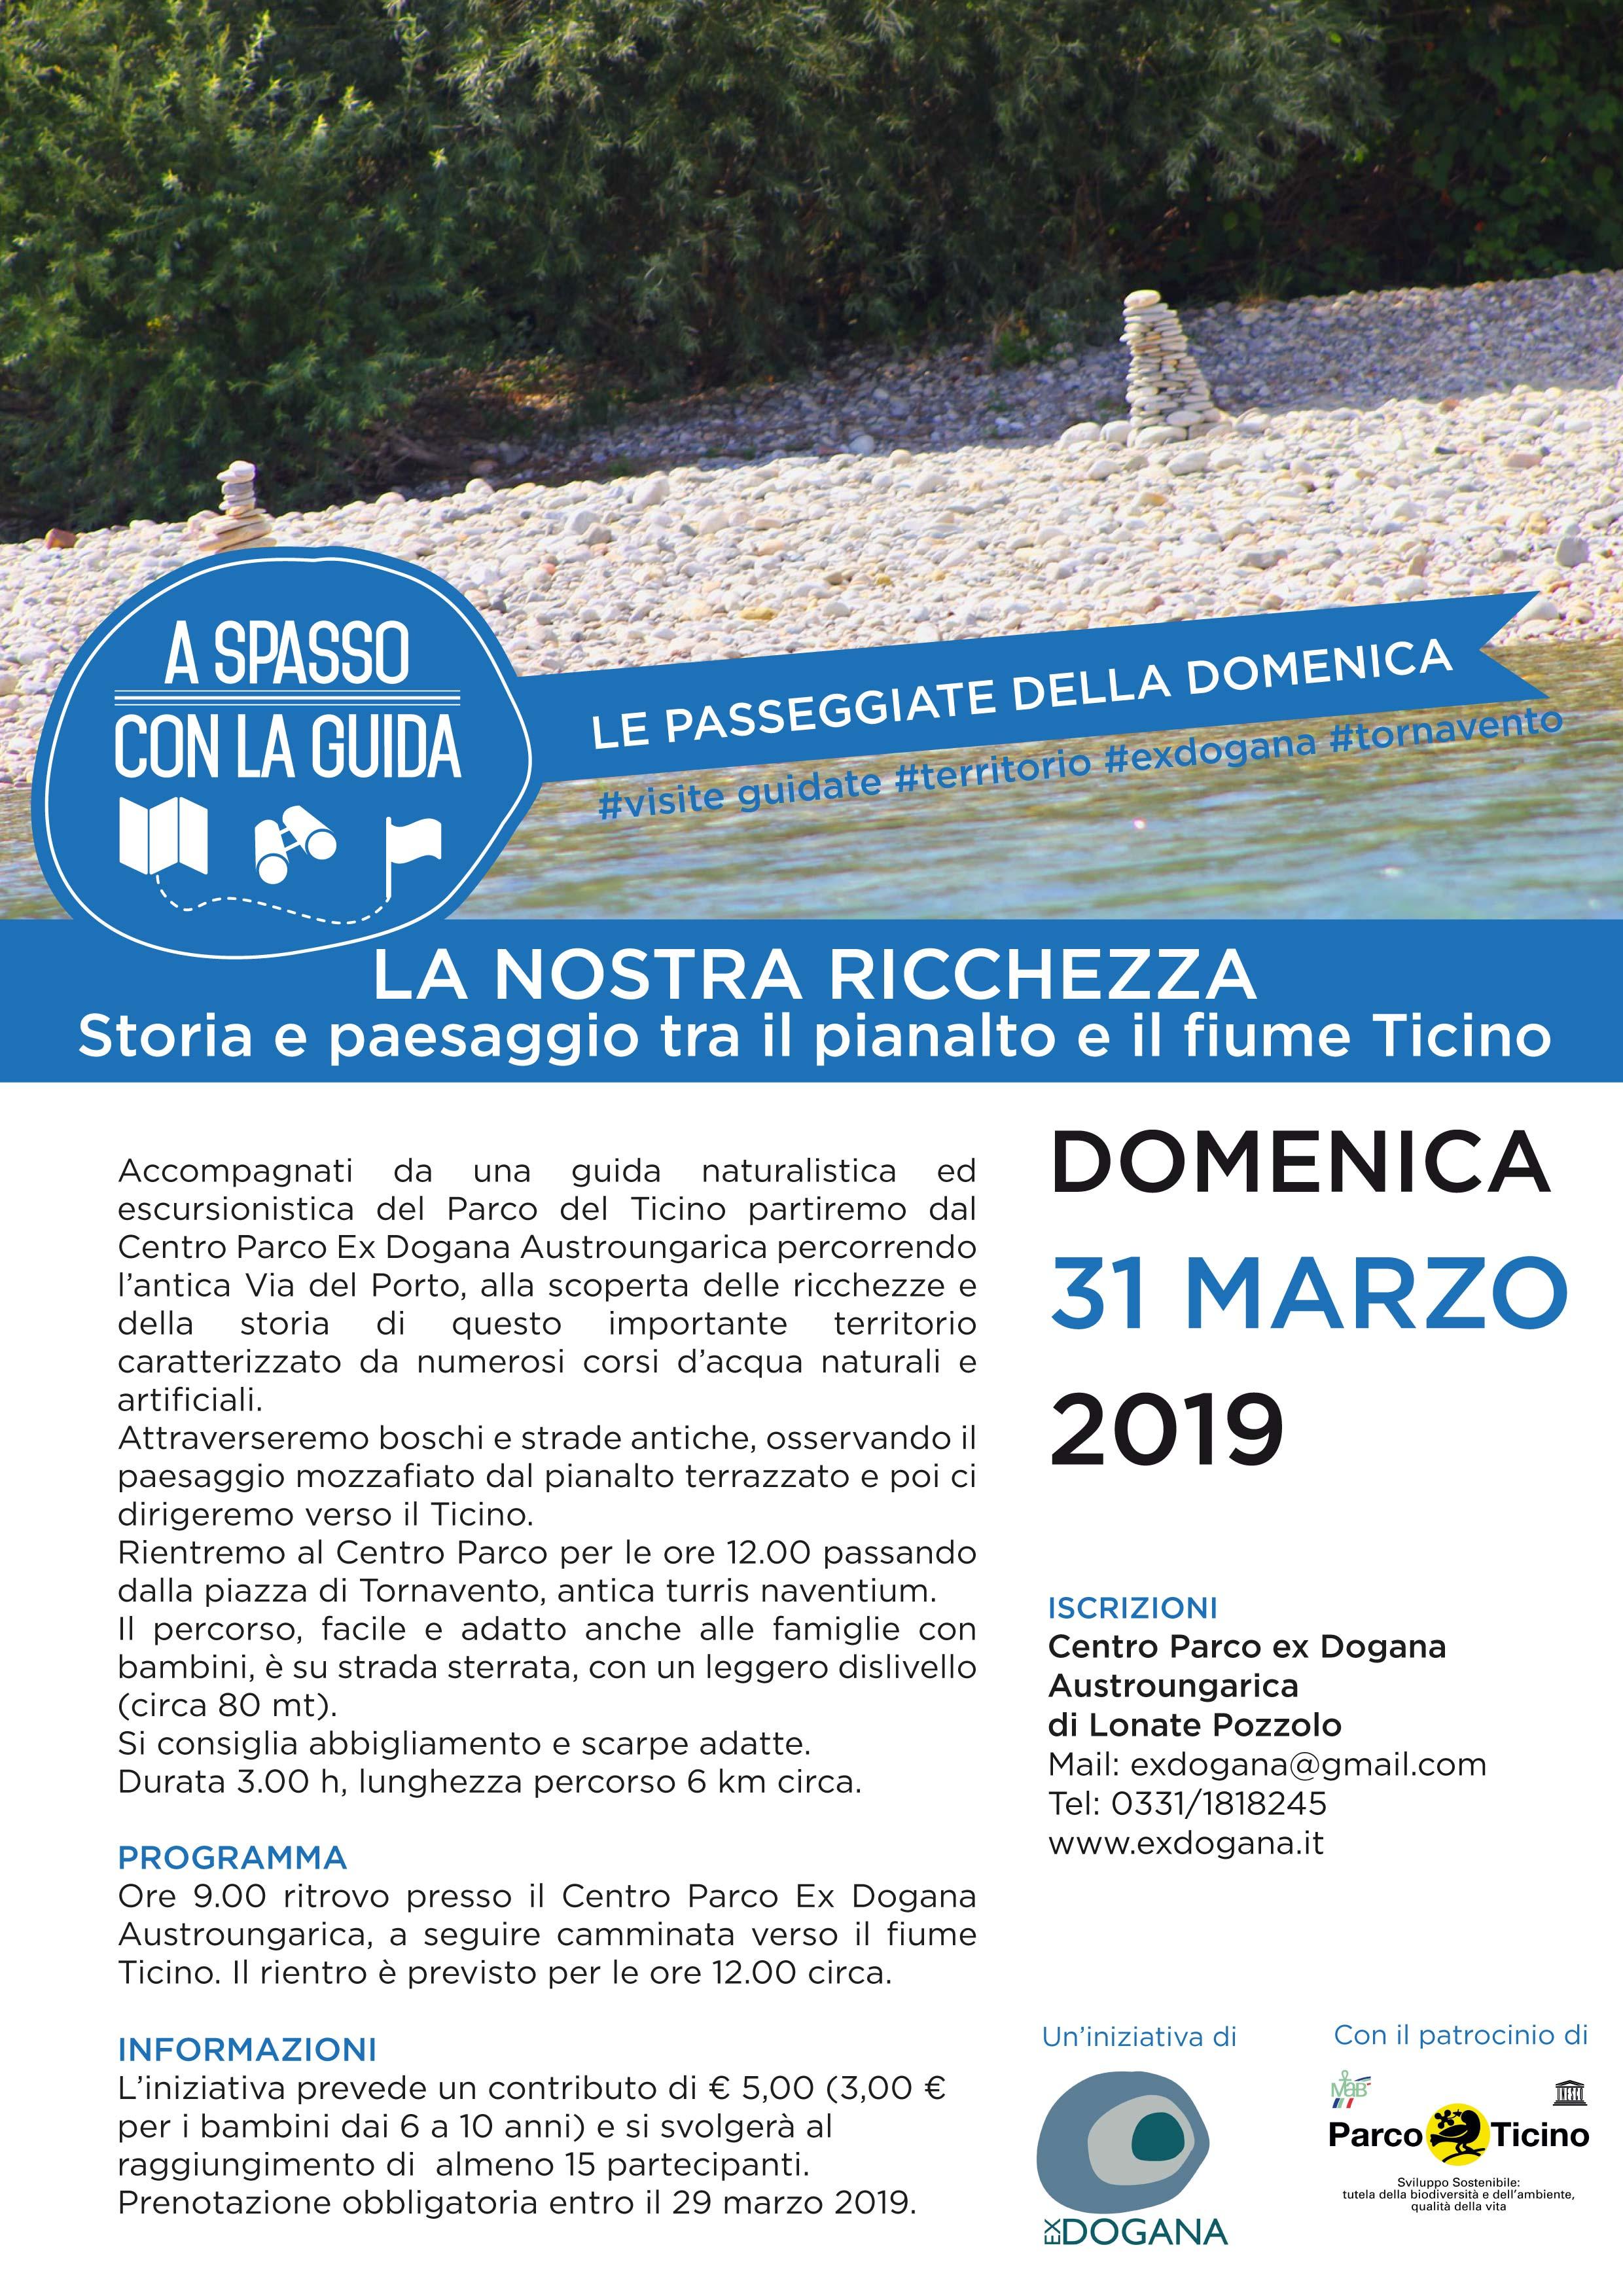 20190331_a_spasso_guida_paolo-06